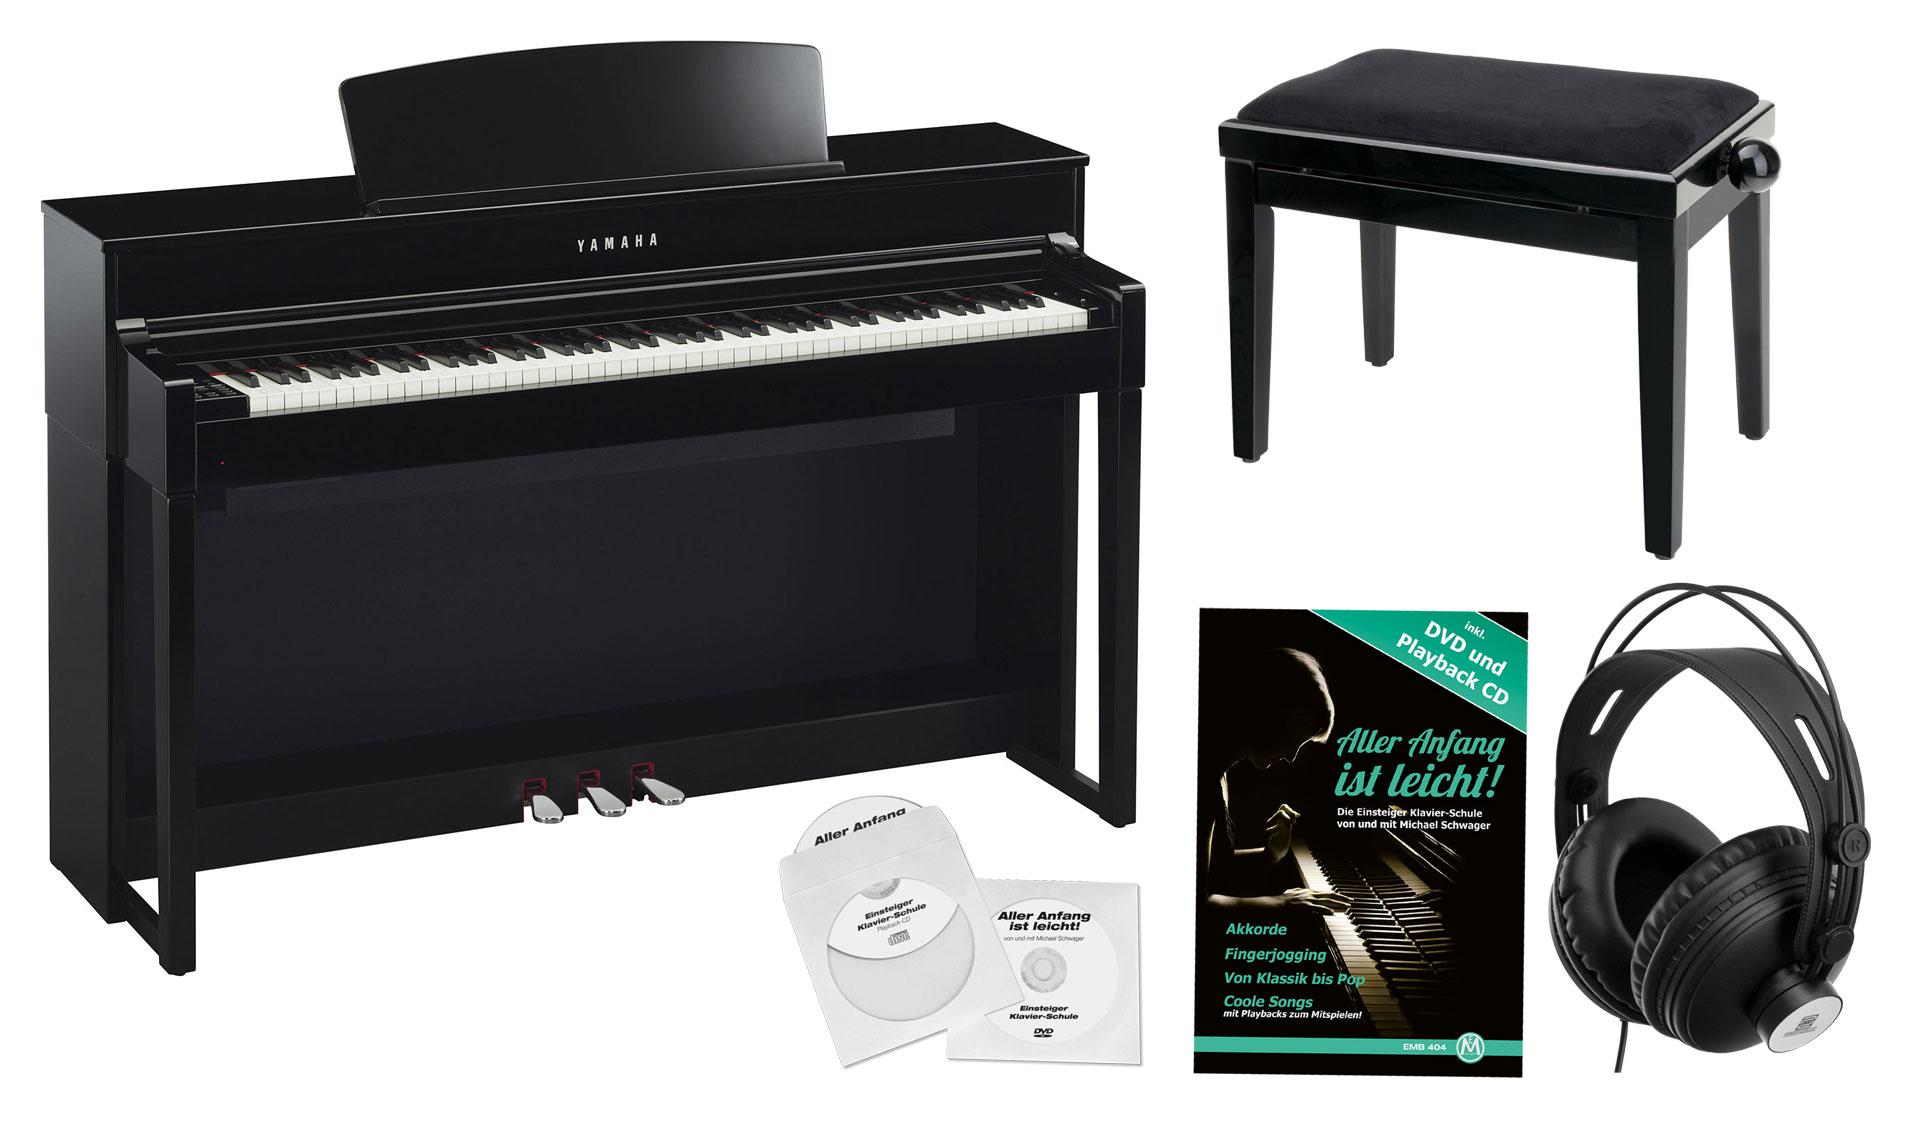 yamaha clp 575 pe digitalpiano schwarz hochglanz set. Black Bedroom Furniture Sets. Home Design Ideas